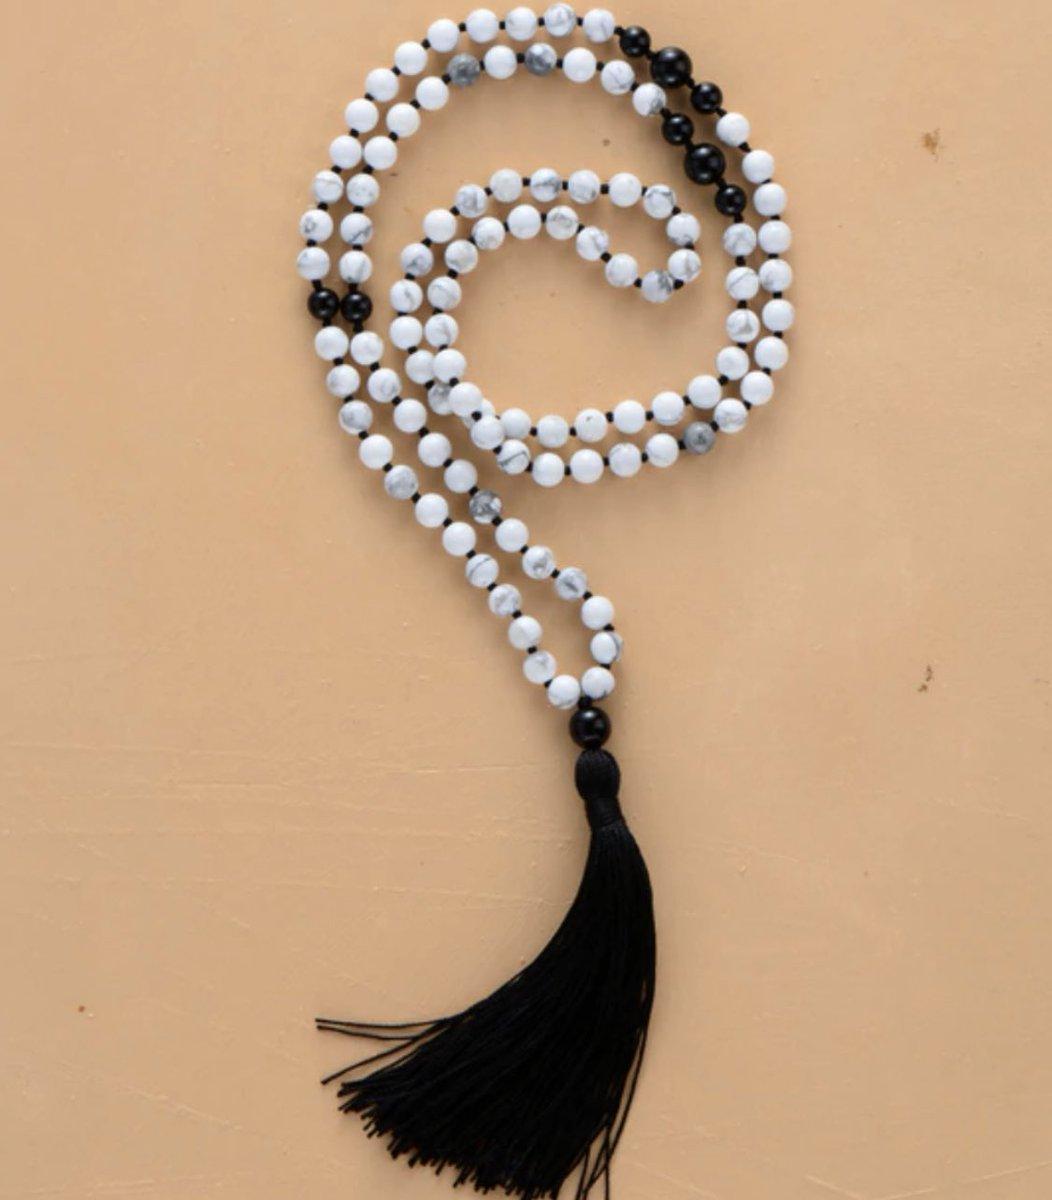 Natural Gemstone Beaded Howlite Mala Necklace Tassel https://egretjewellery.co.uk/products/natural-gemstone-beaded-howlite-mala-necklace-tassel… #necklace #beadednecklace #beads #mala #malanecklace #jewellerywithmeaning #jewelrylovers #jewelryaddit #jewellerylovers #jewelleryaddict #bohojewellery #bohojewelrypic.twitter.com/kifdrF9bRM